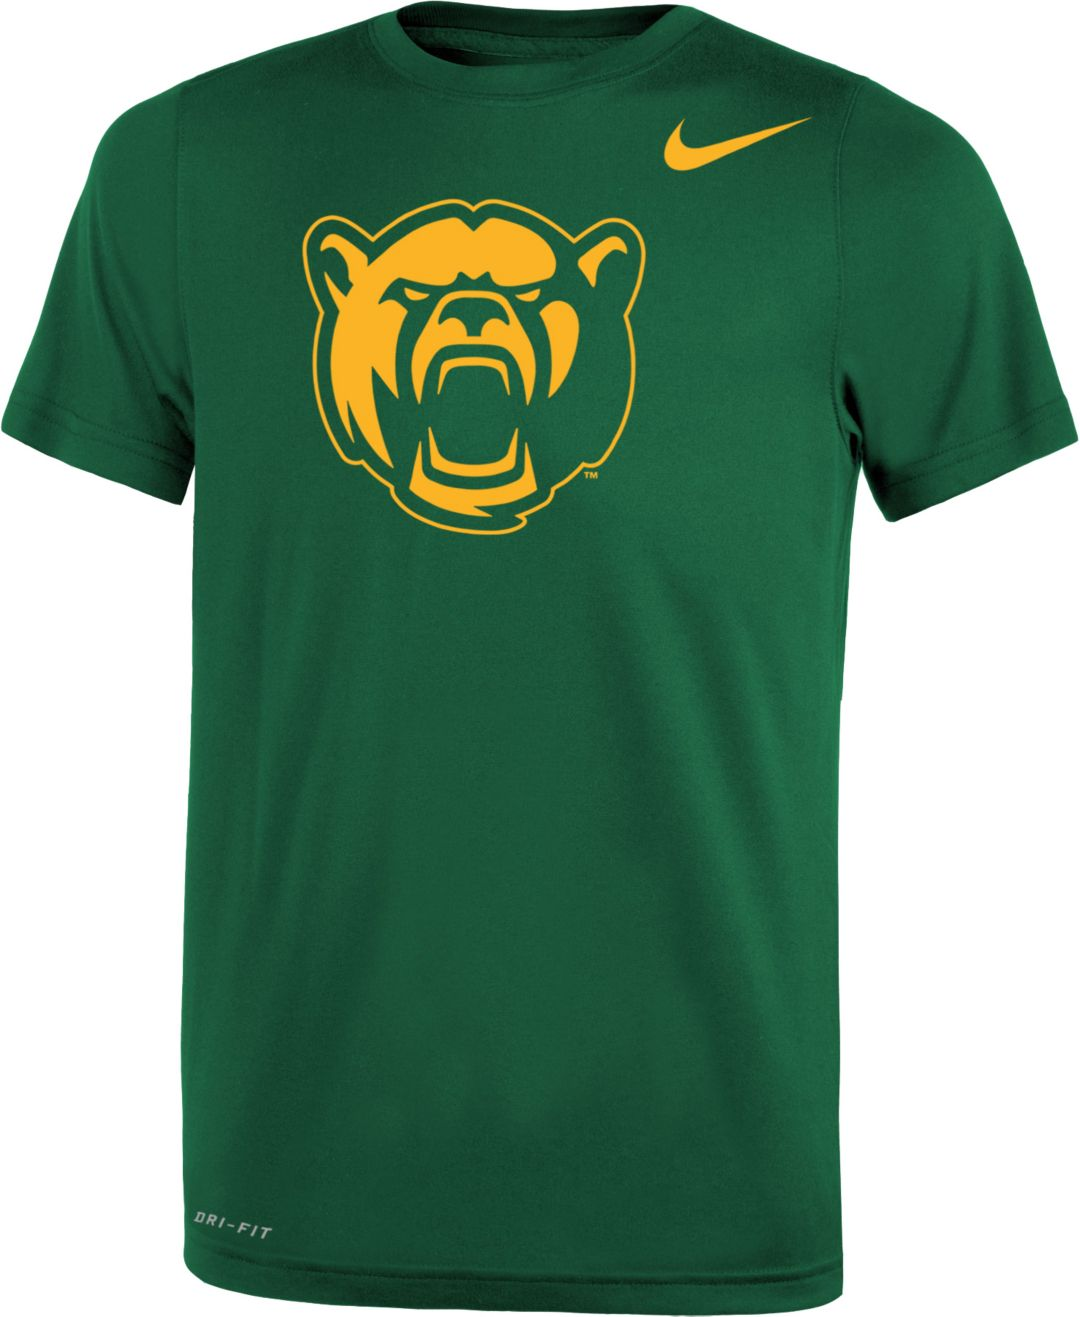 862edc13acaefc Nike Youth Baylor Bears Green Logo Dri-FIT Legend 2.0 T-Shirt ...